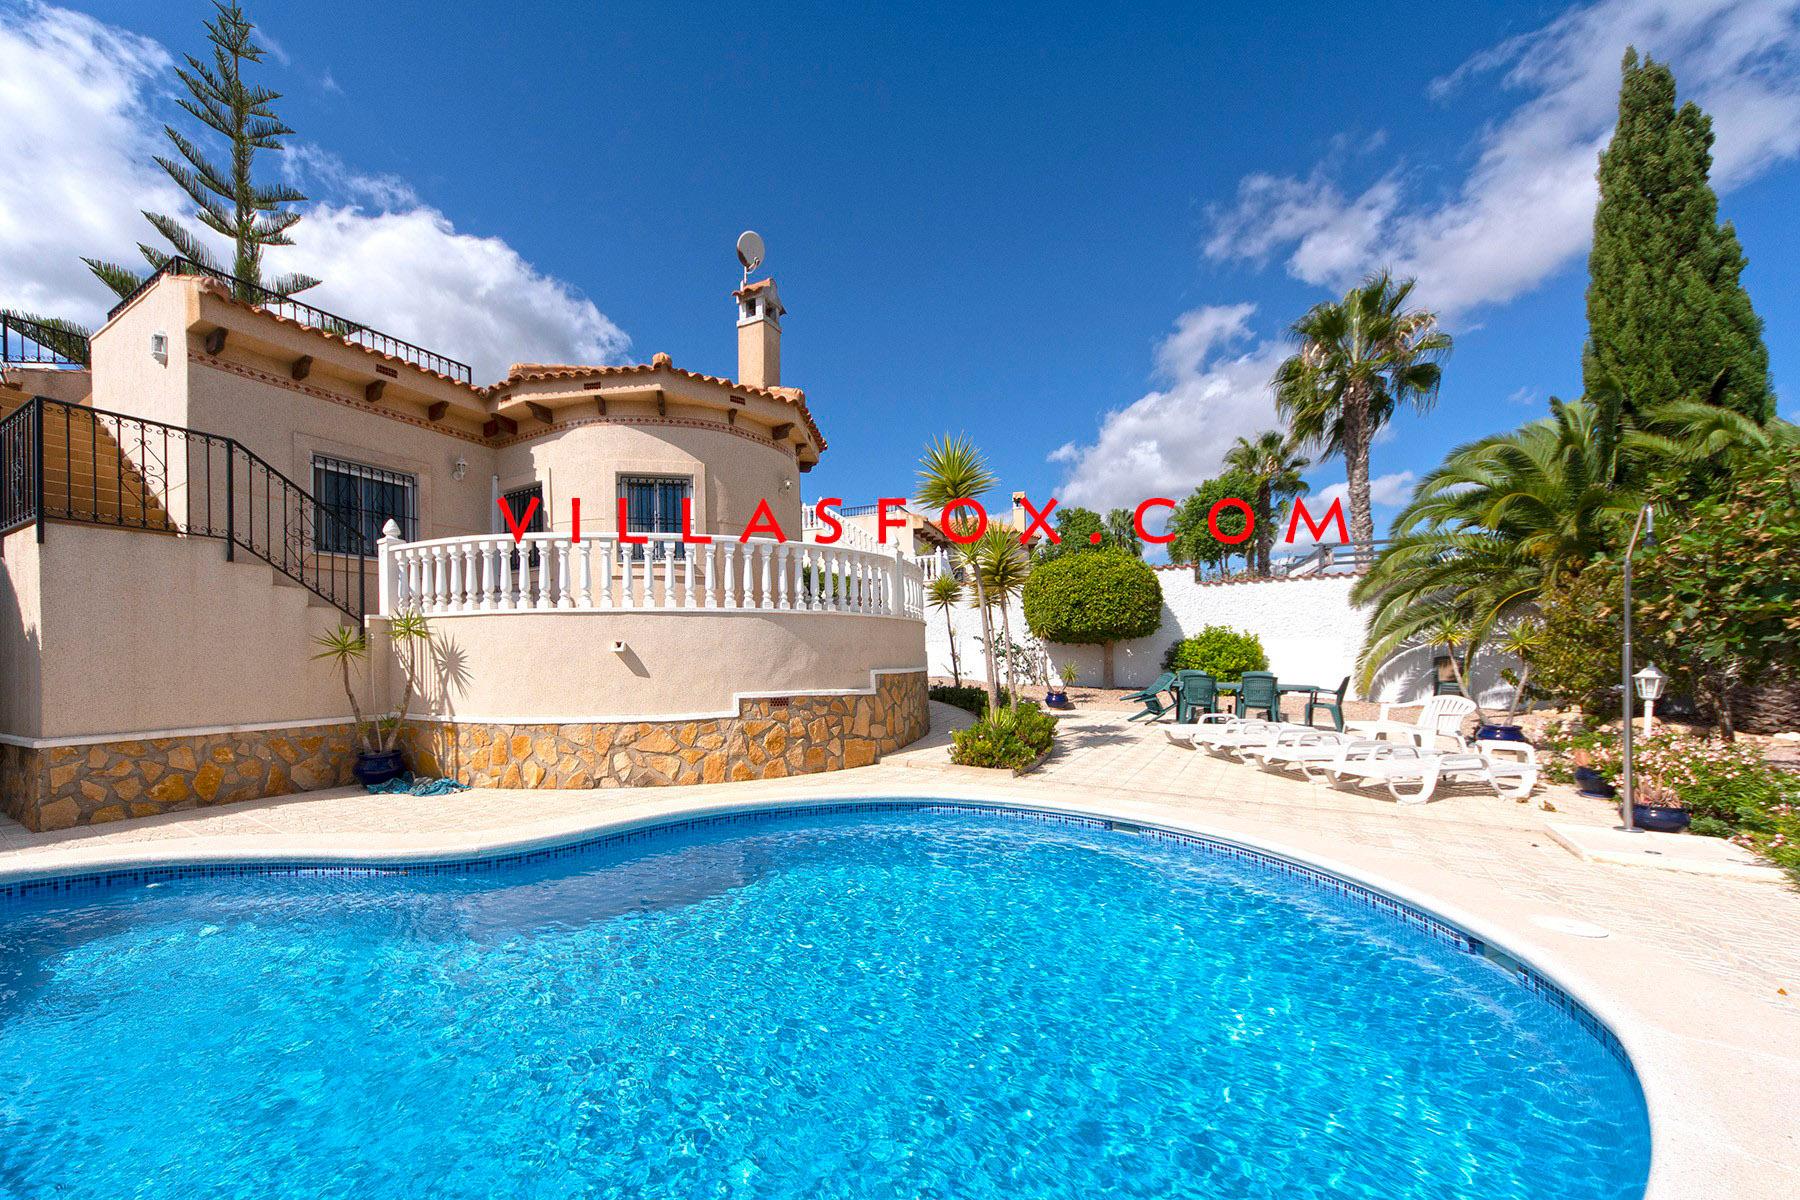 1 San Miguel de Salinas Frittliggende villa i Las Comunicaciones av Villas Fox beste eiendomsmeglere